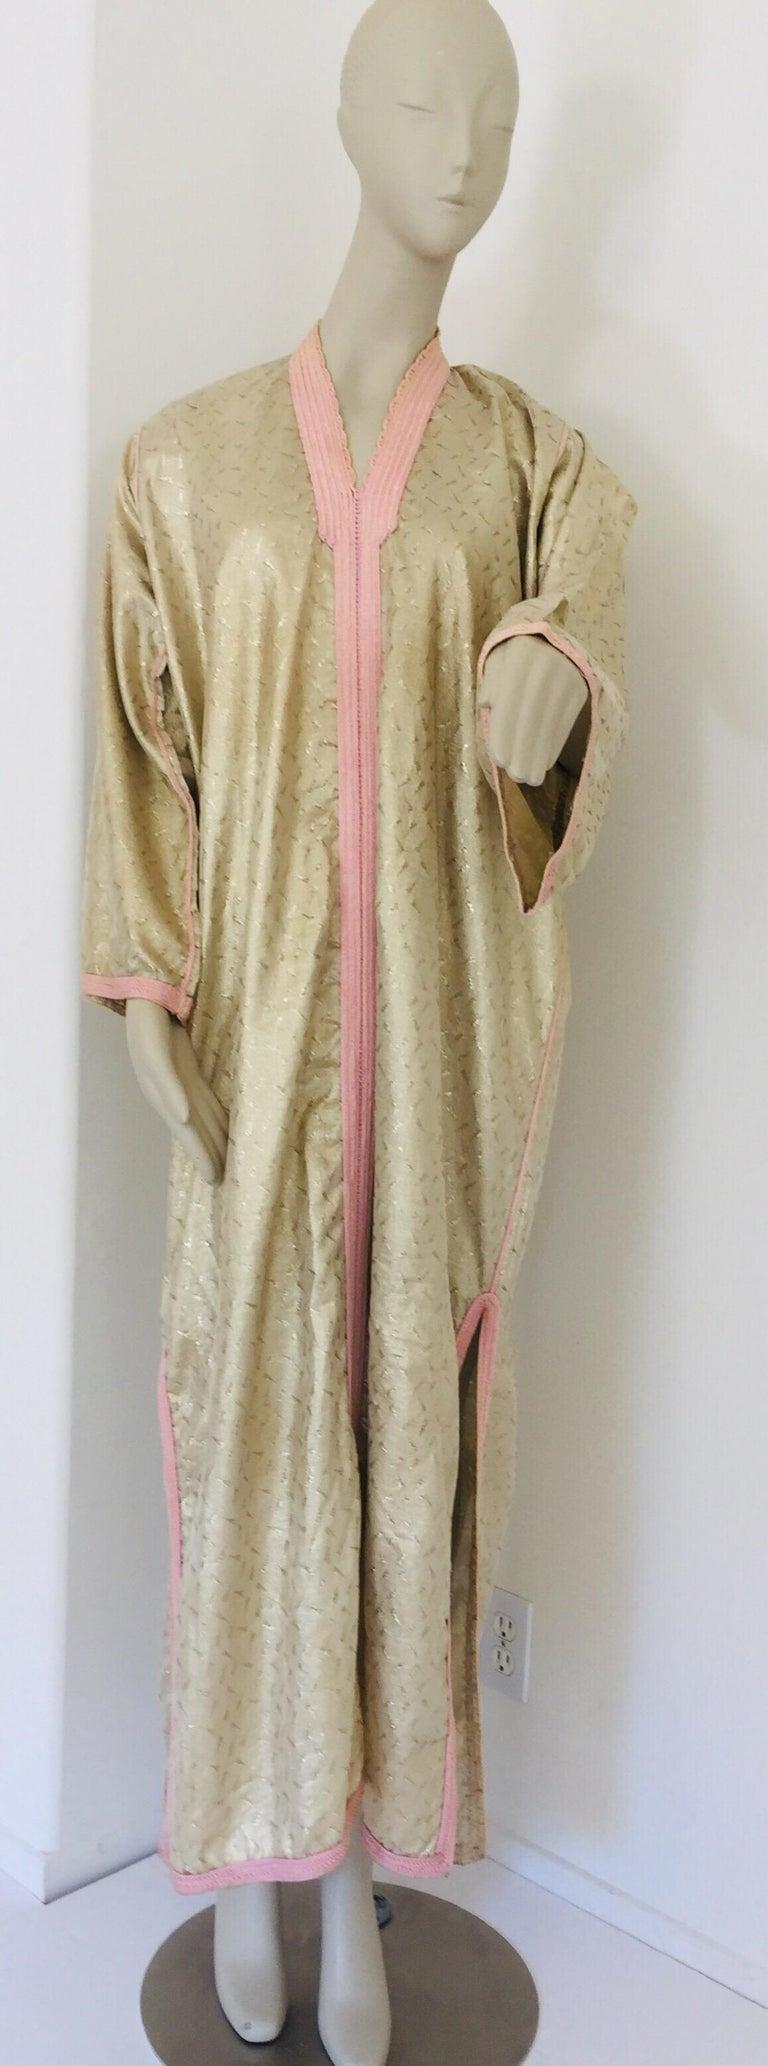 20th Century 1970s Metallic Gold Moroccan Caftan, Kaftan Maxi Dress North Africa, Morocco For Sale